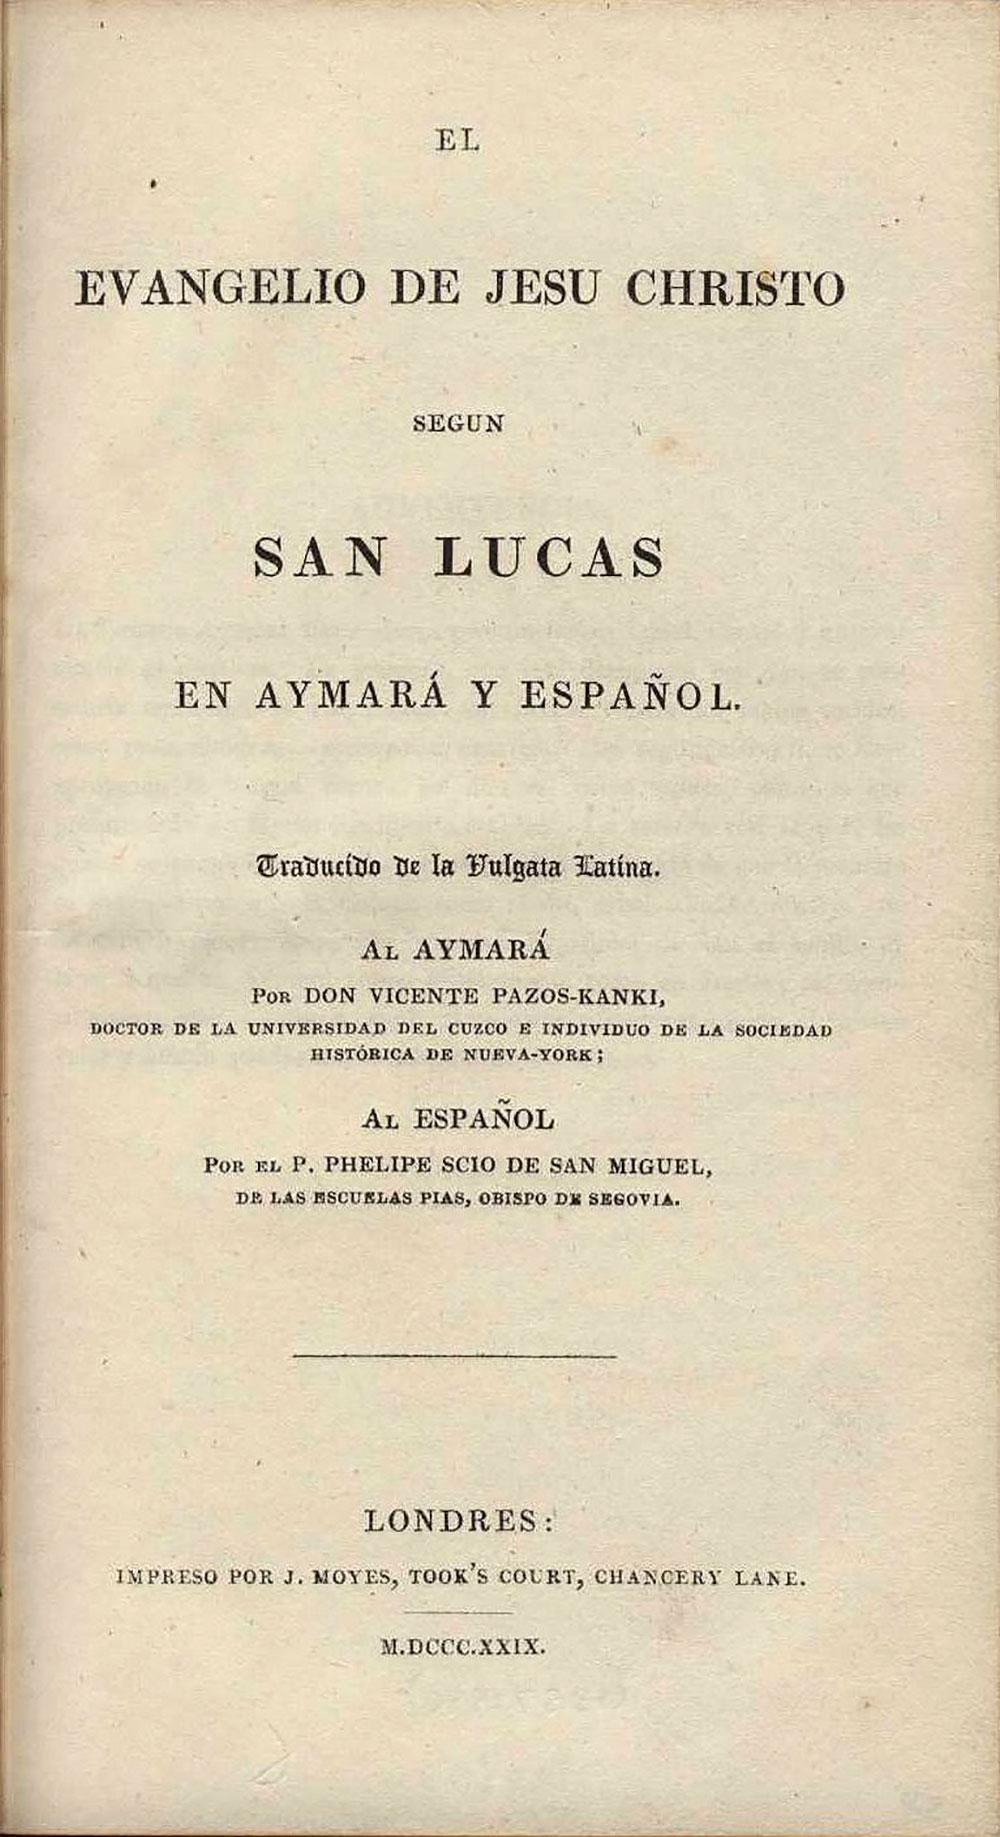 [Aymara and Spanish Gospel of Luke]. <em>El Evangelio de Jesu Christo segun San Lucas en Aymara y Español.</em> Londres: J. Moyes, 1829.